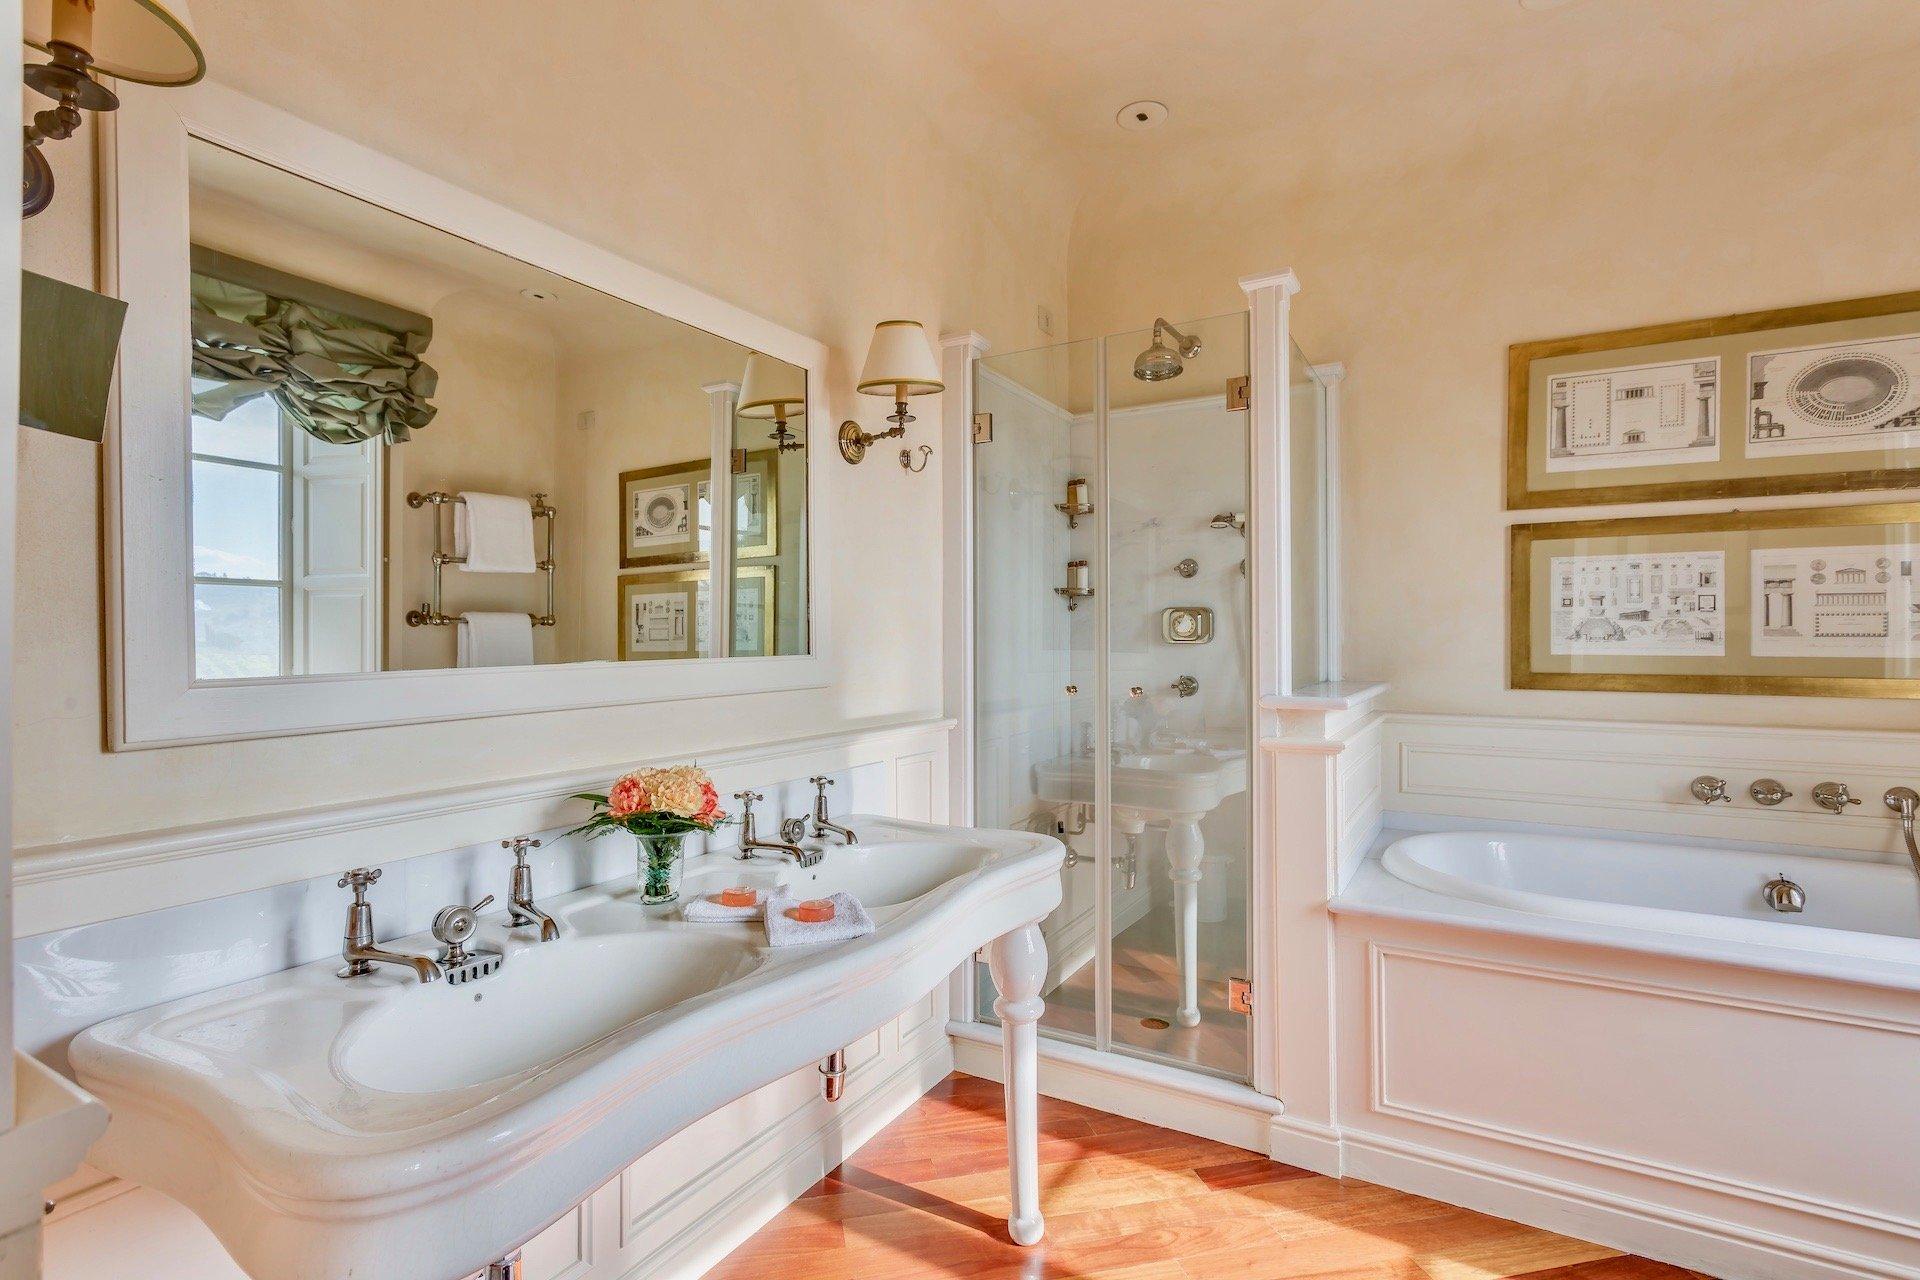 34.The Green Bathroom